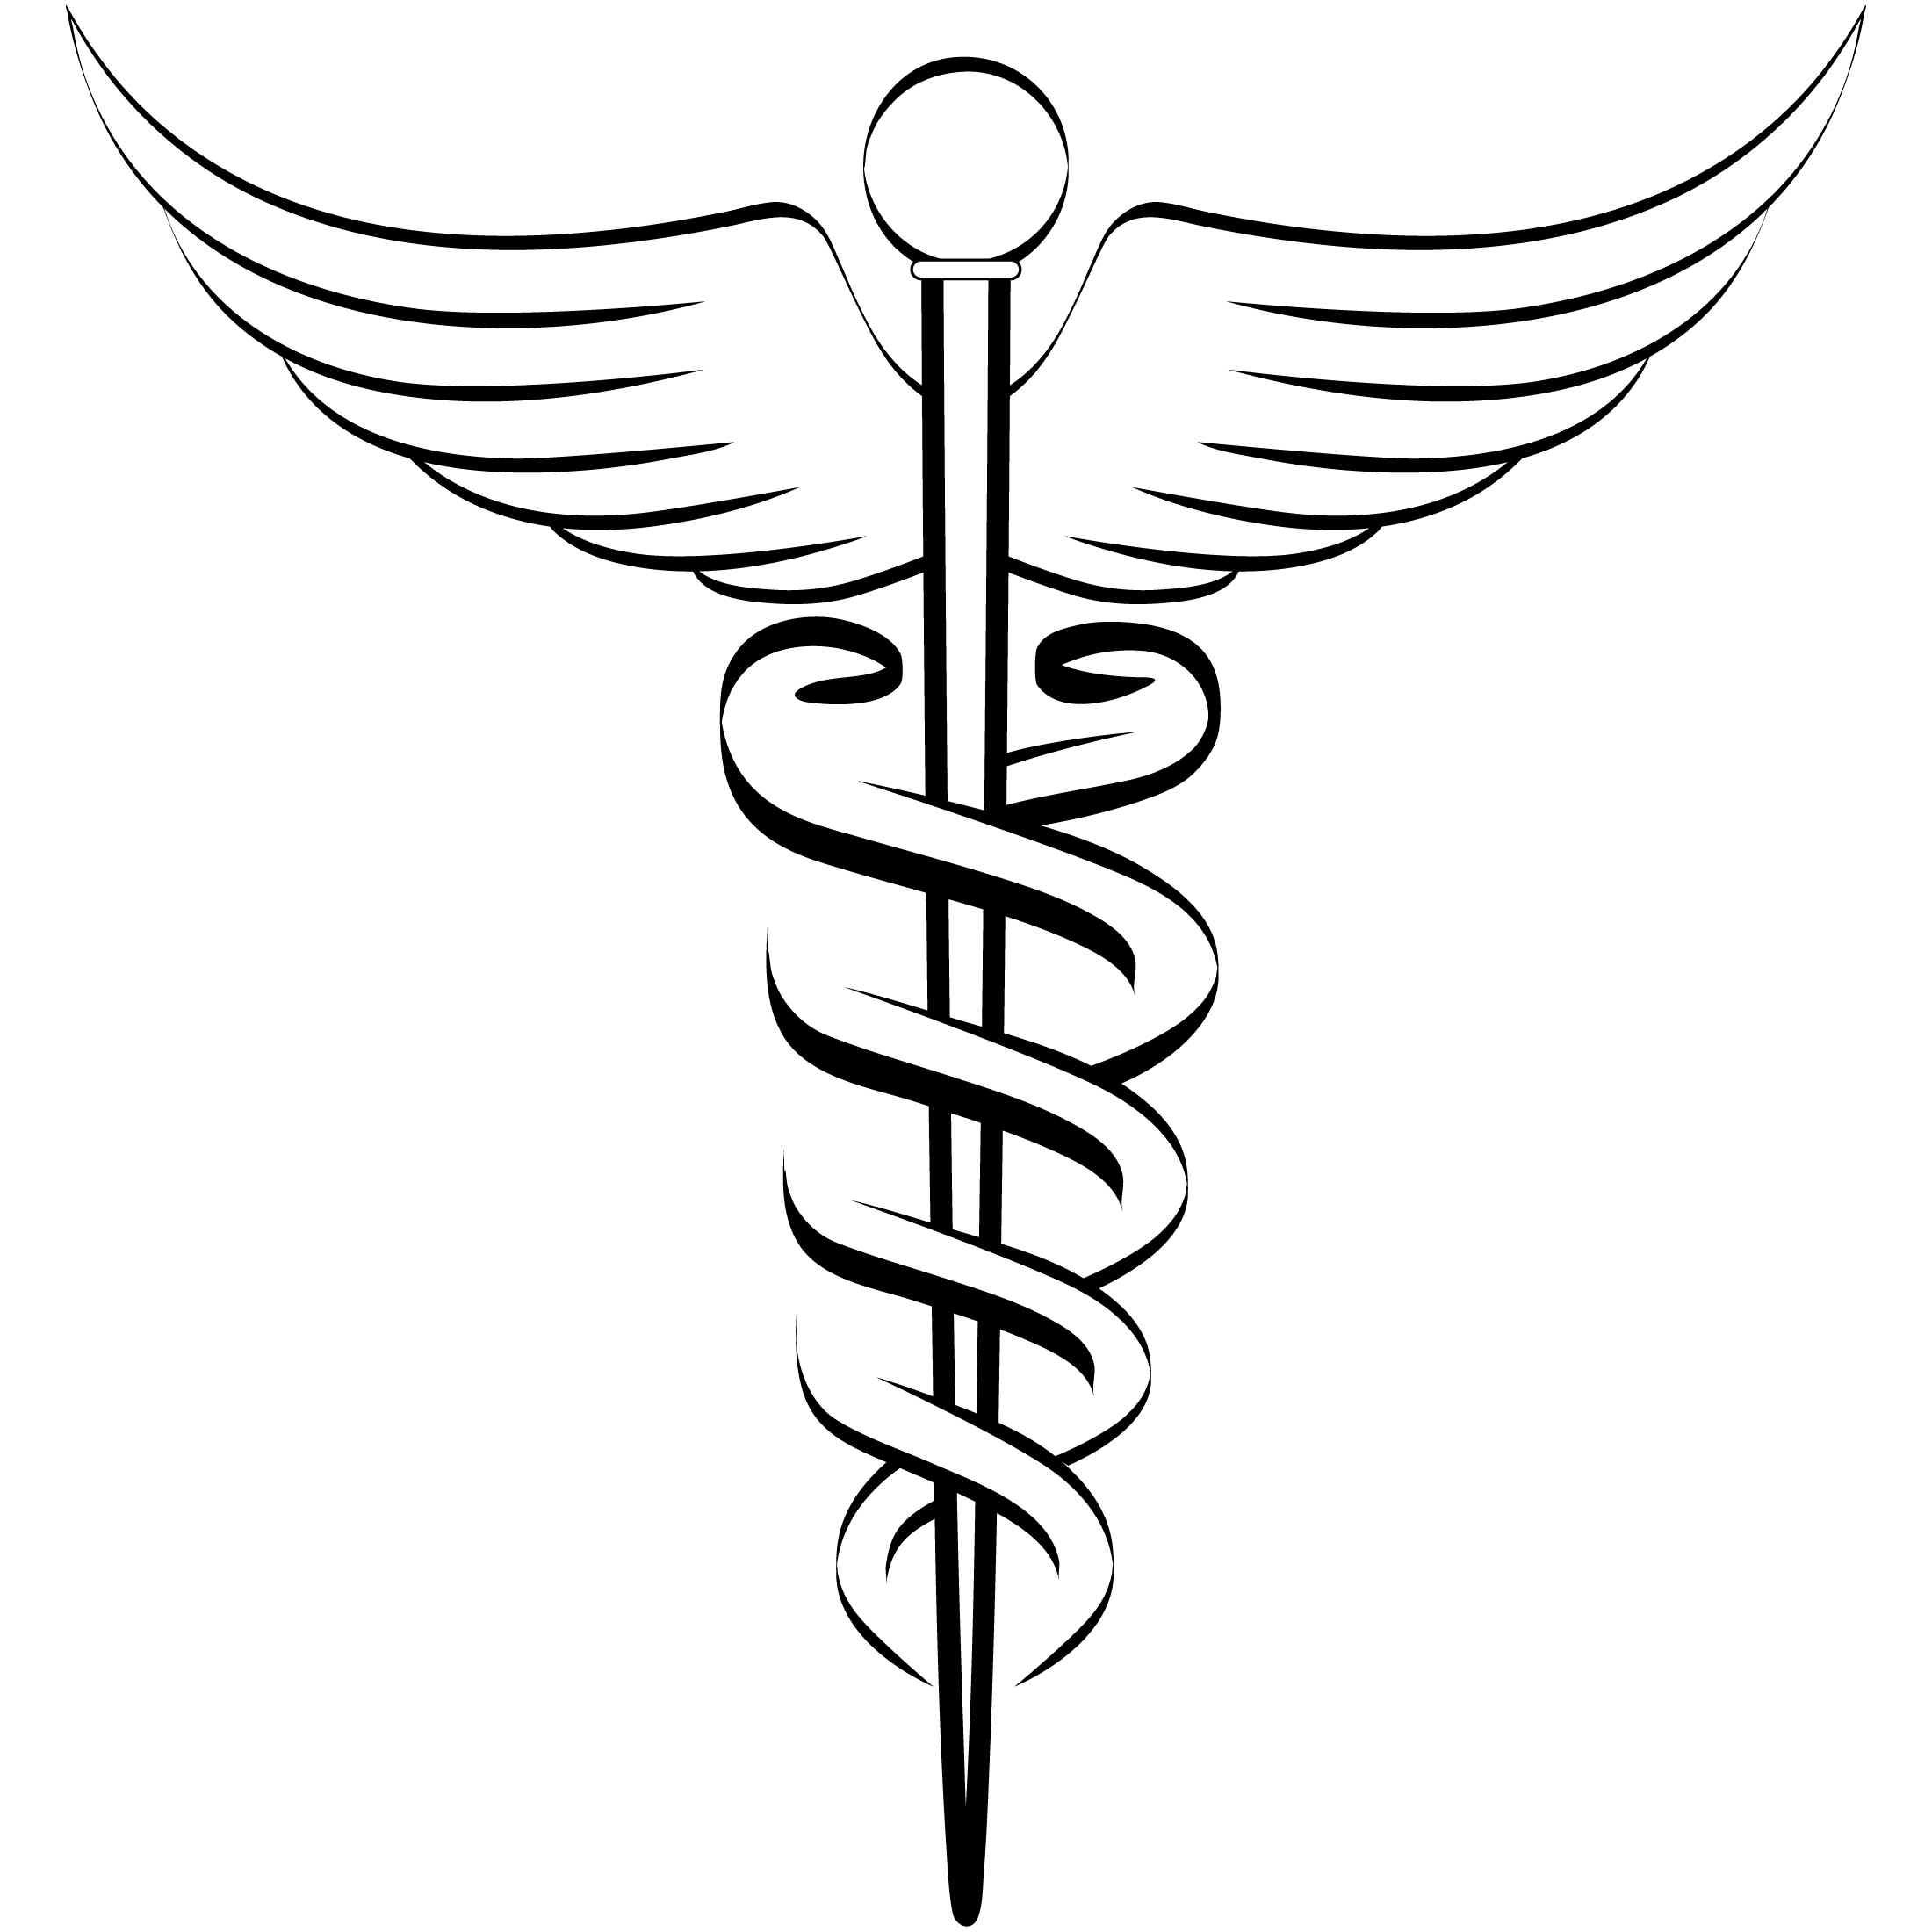 caduceus tattoo pls nurse tattoo pinterest caduceus tattoo rh pinterest com caduceus vs vector division Cadeuces Vector